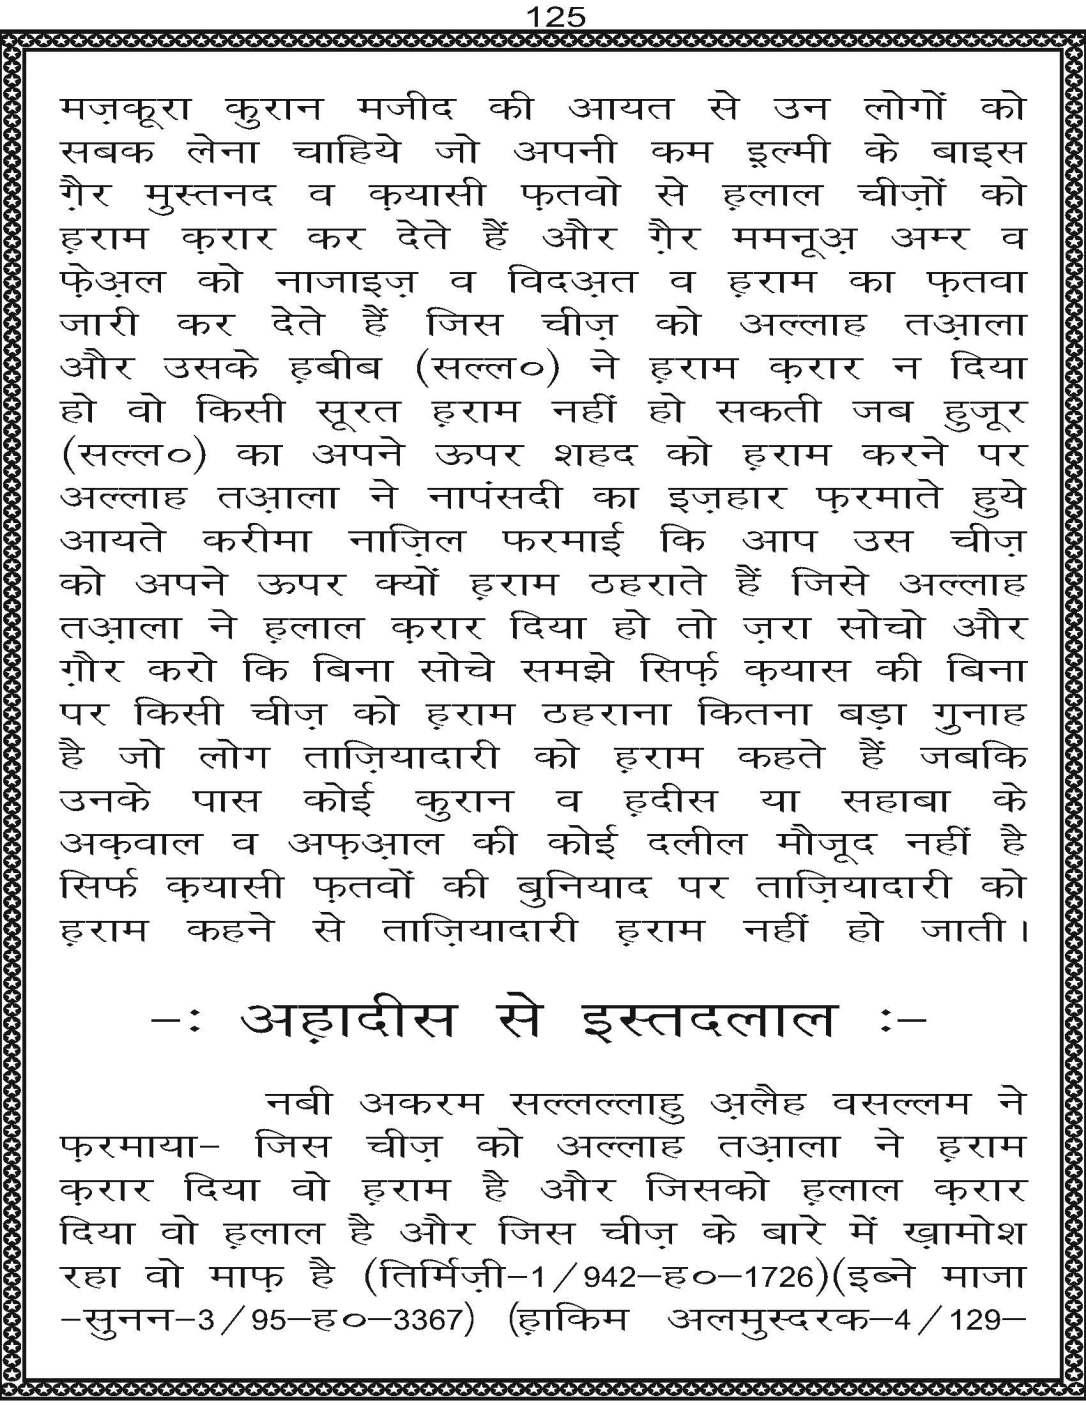 AzmateTaziyadari_Page_125